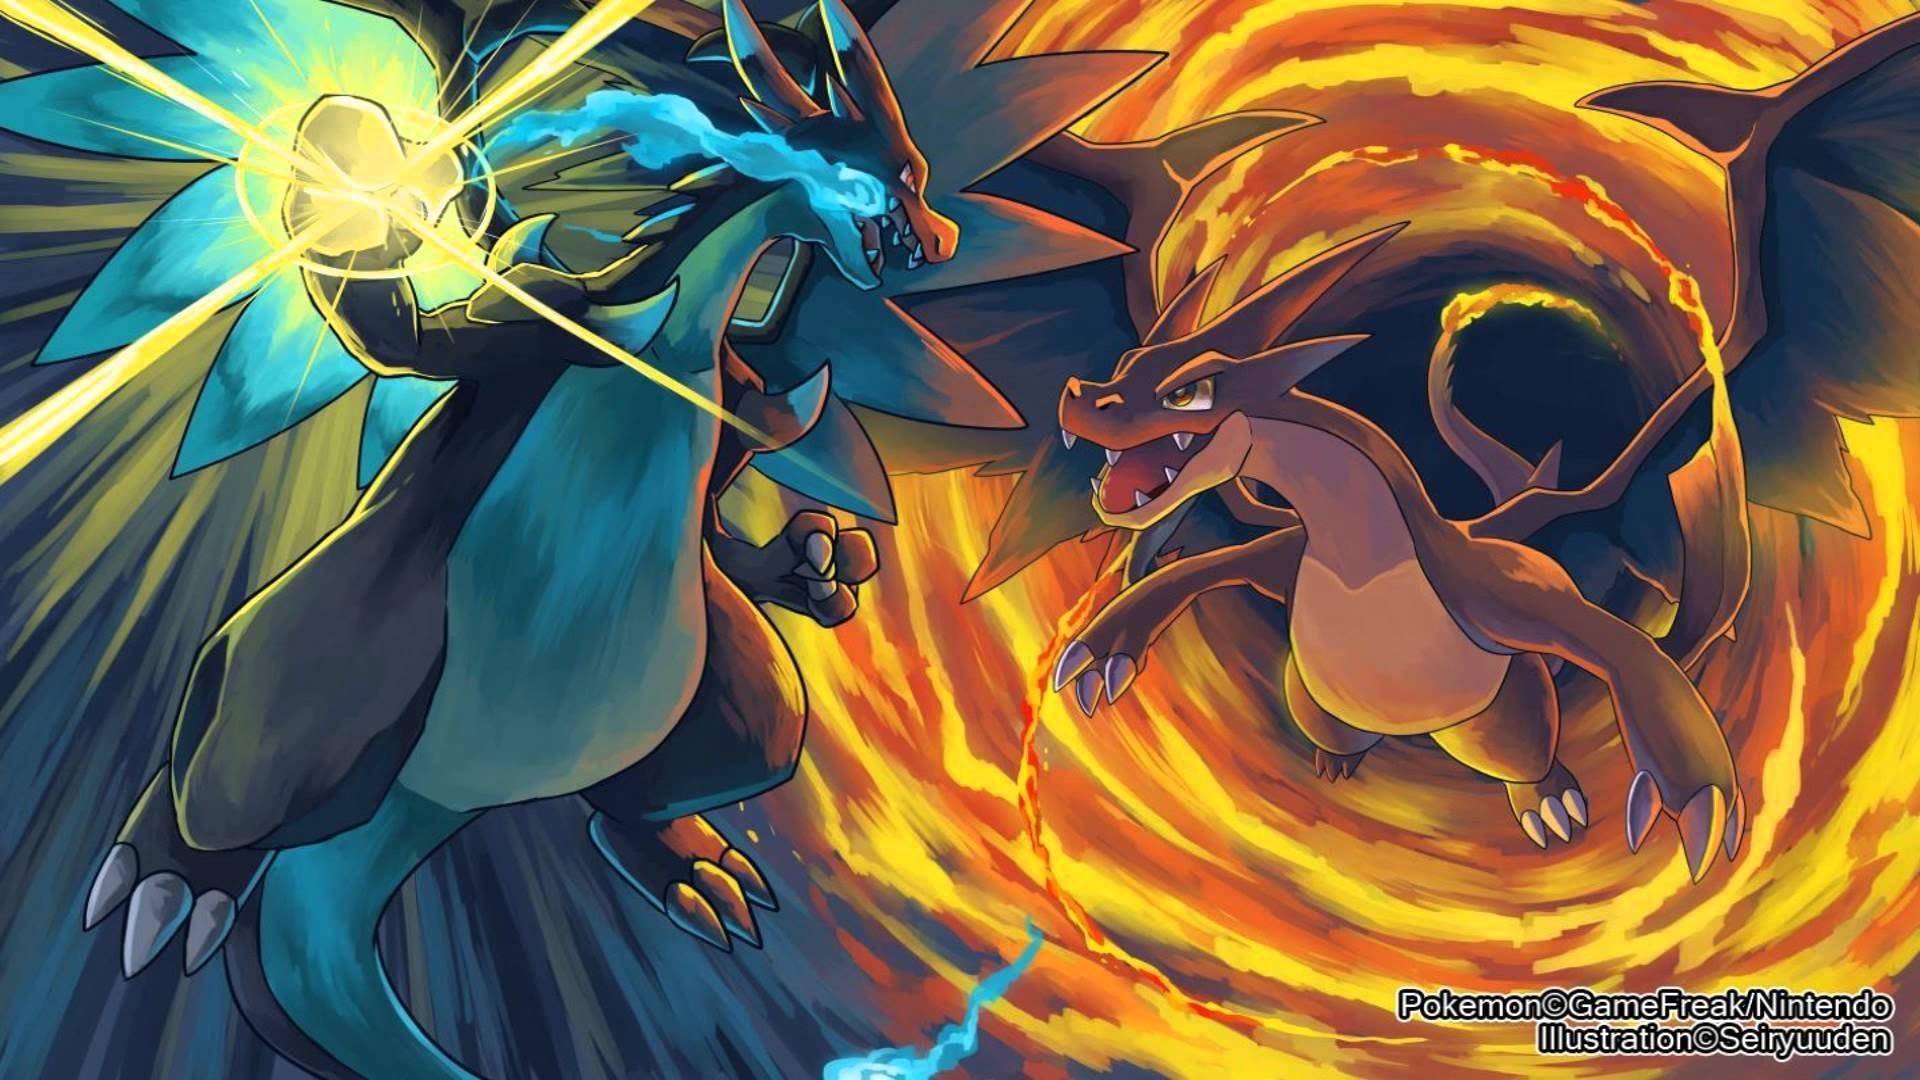 Cute Charizard Wallpaper Pokemon Mega Charizard Wallpaper 70 Images